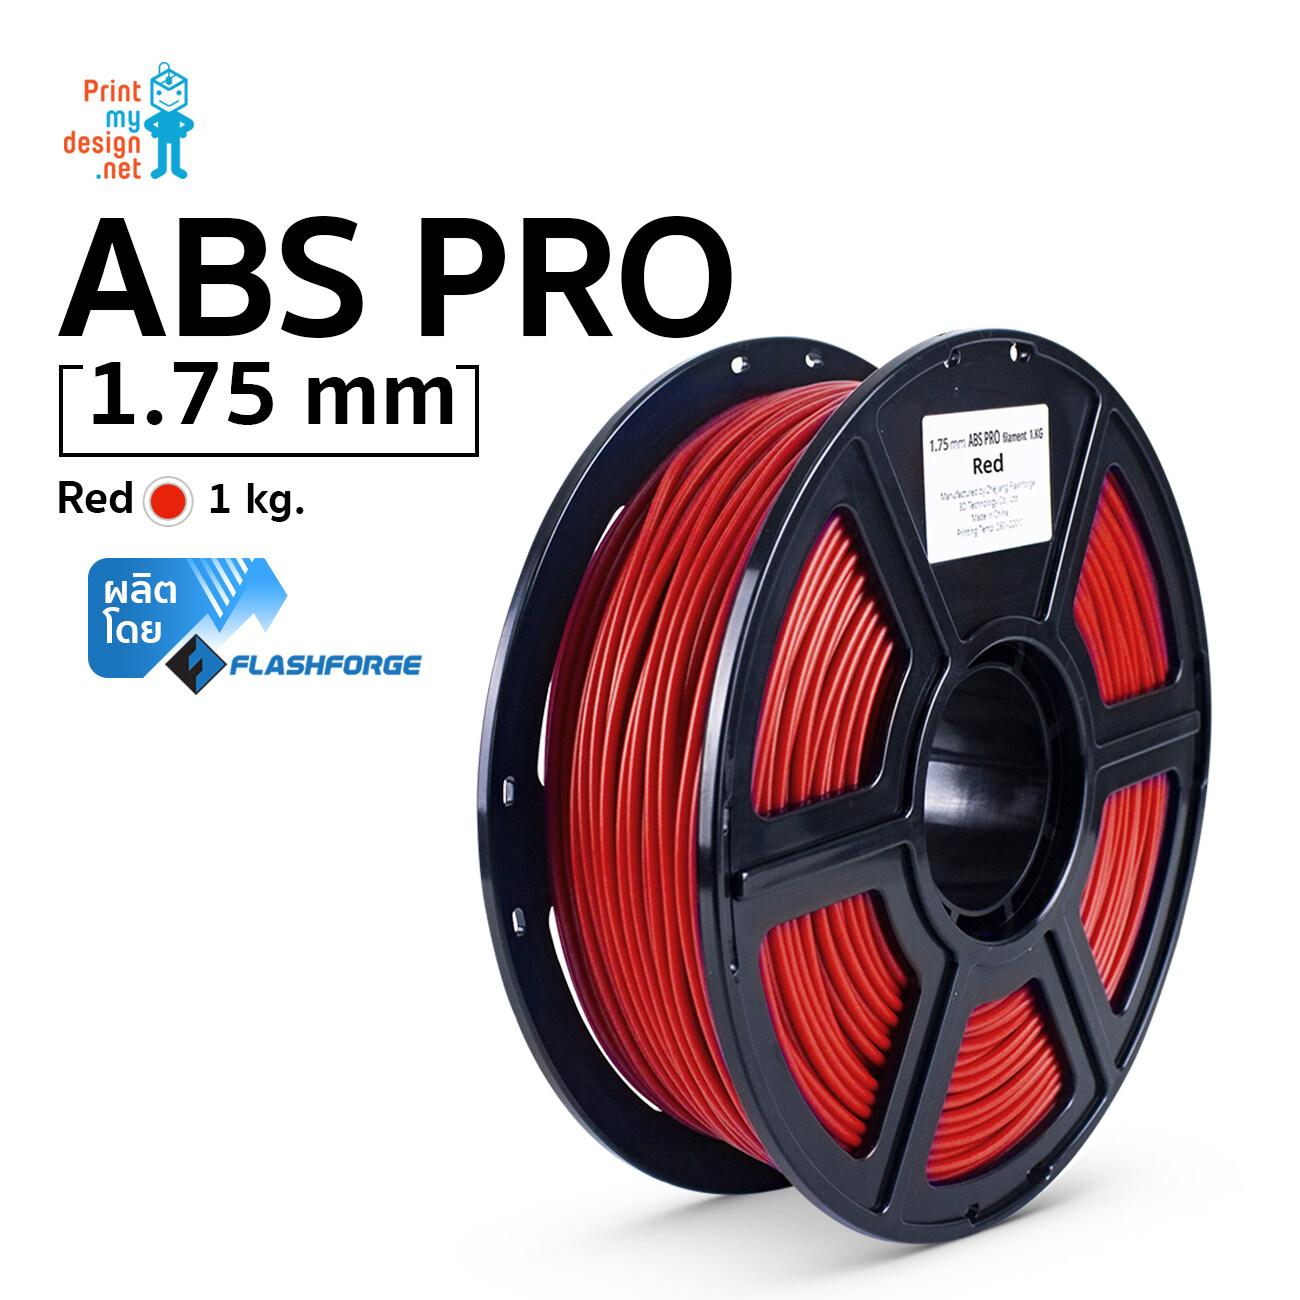 Septillion Printmydesign Abs Pro 1.75 Red 1kg. / เส้นพลาสติก Abs Pro สำหรับเครื่องพิมพ์ 3 มิติ / ผลิตโดย Flashforge Oem / Abs Filament For 3d Printer / ขนาด 1.75 มม. / 1 กก. / สีแดง / ราคาถูก ประหยัด.